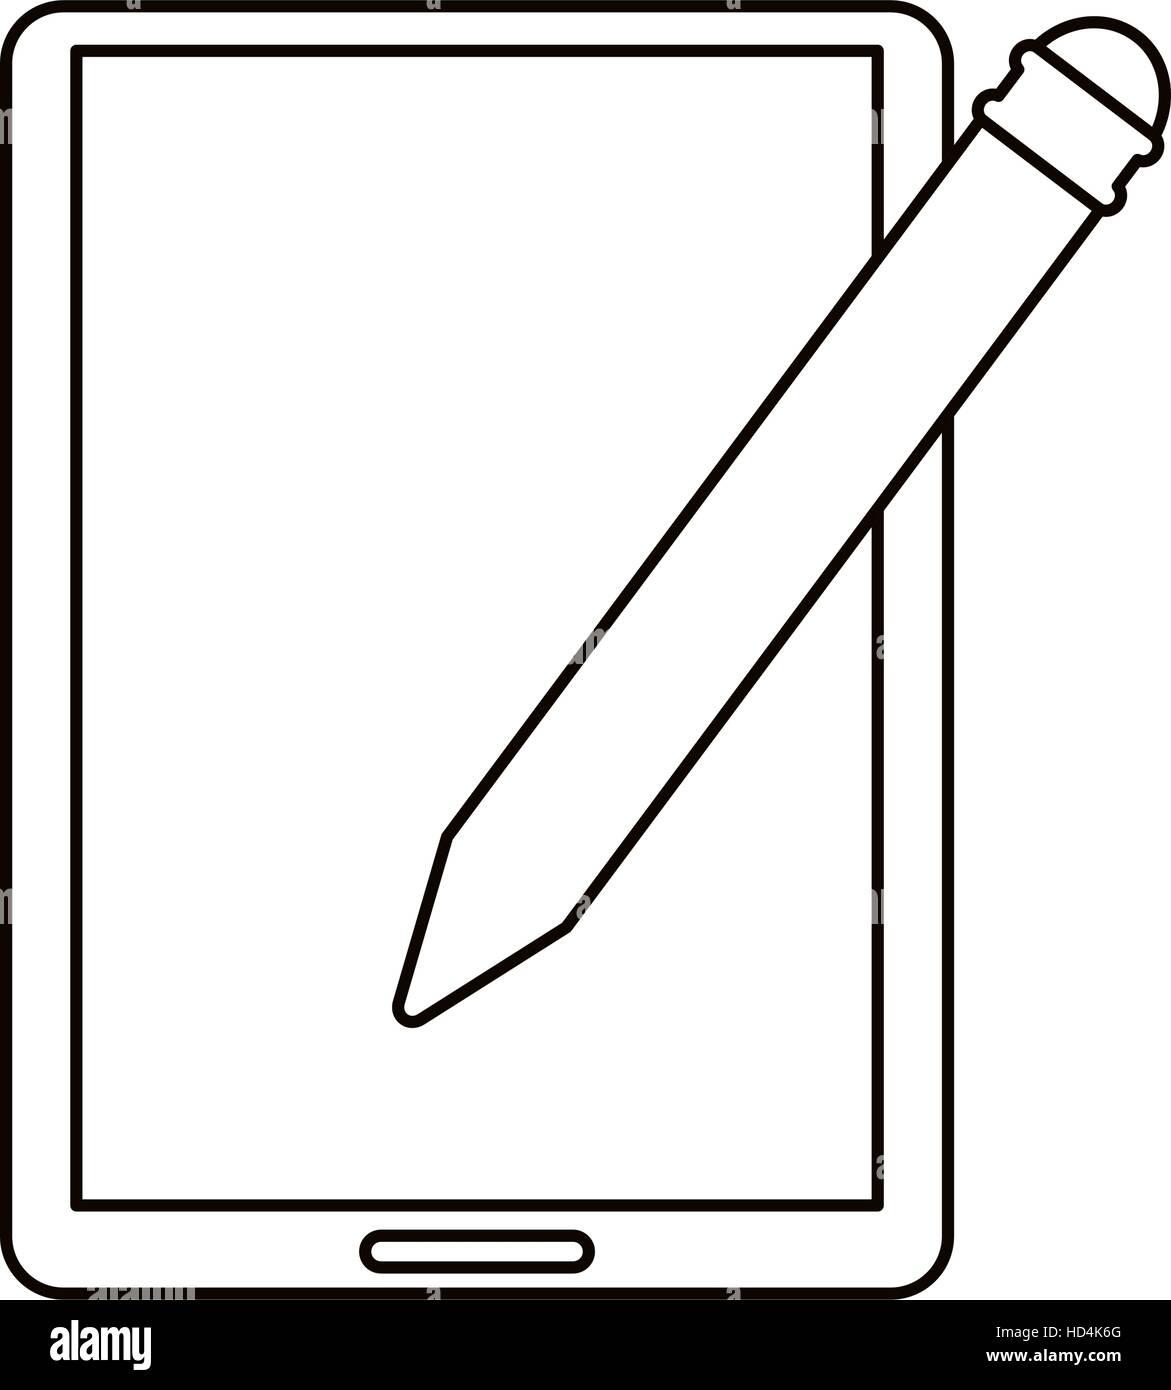 tablet pen digital technology outline - Stock Image